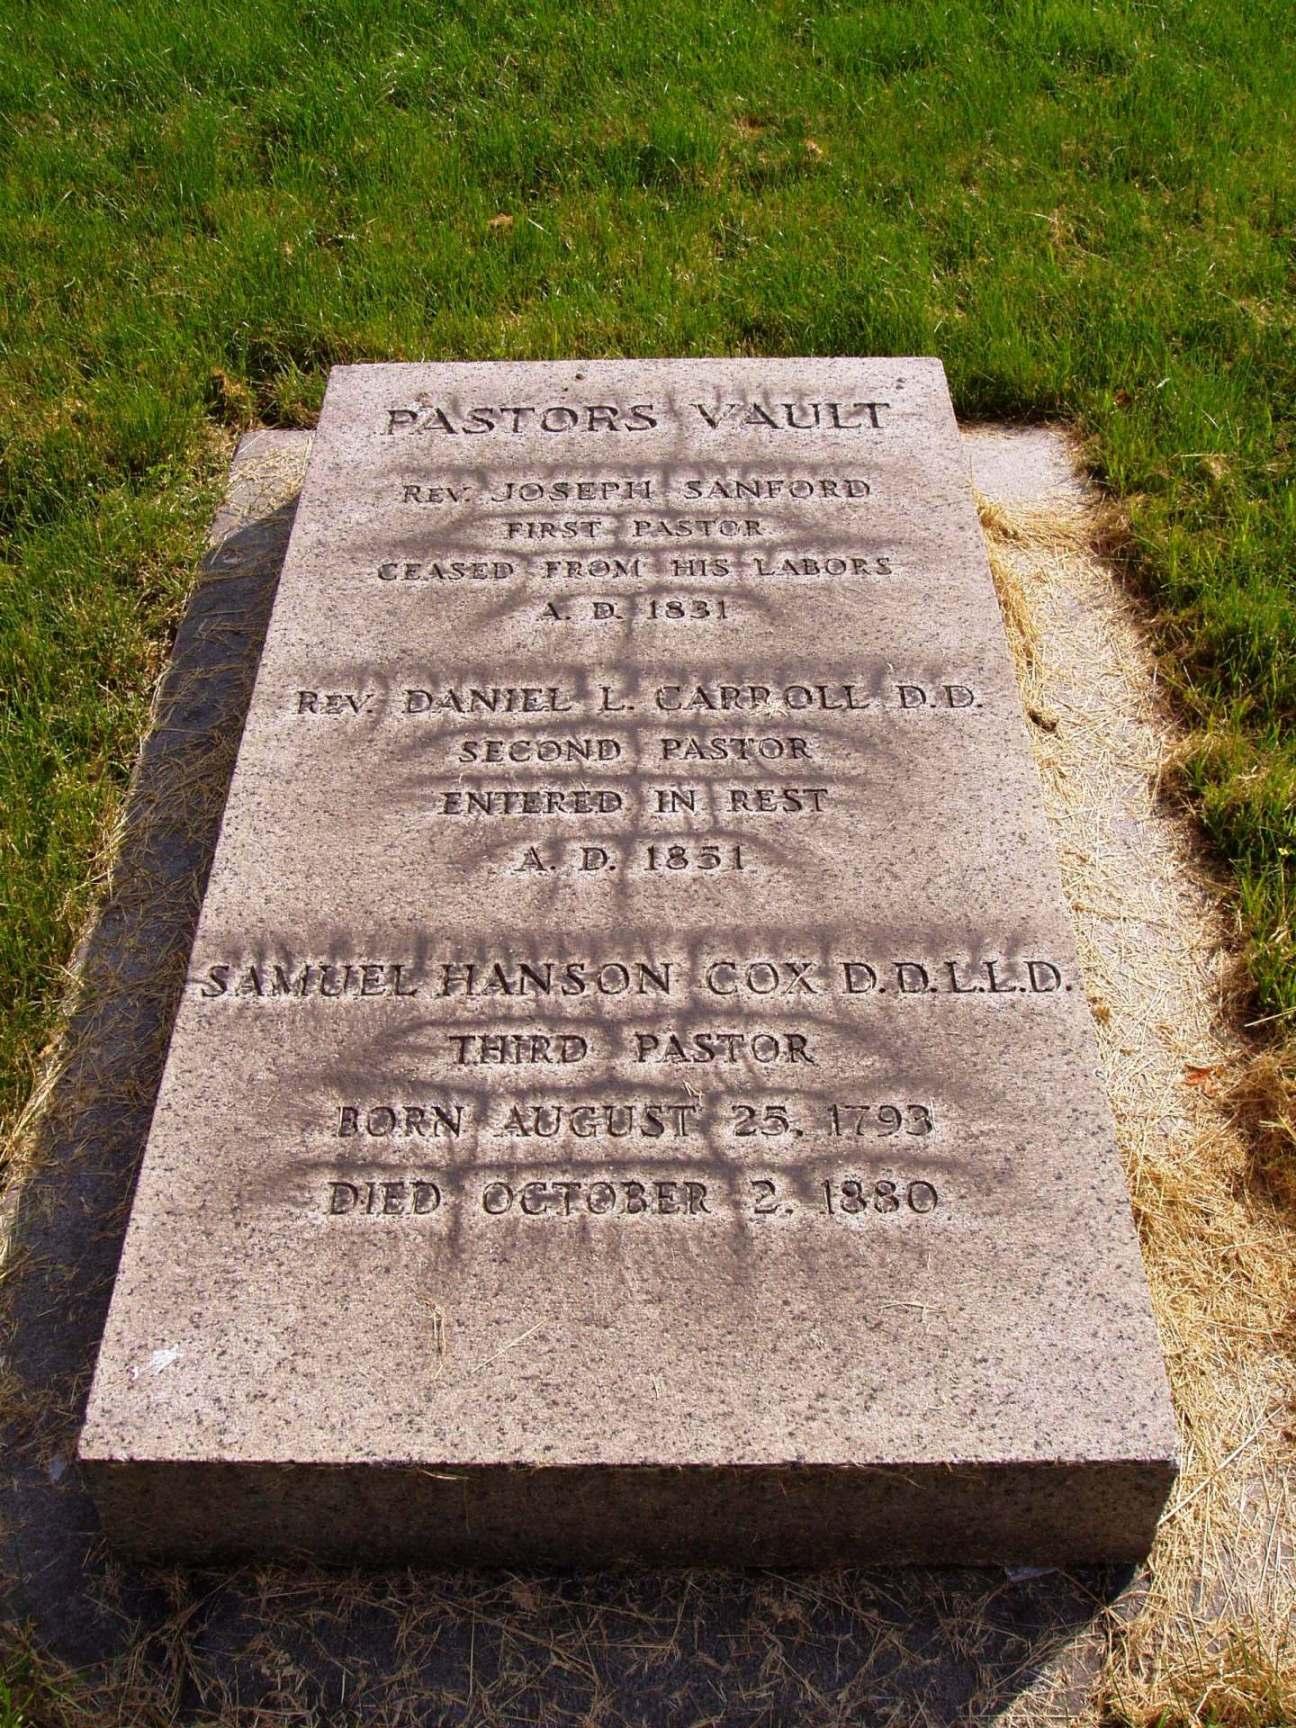 Samuel Hanson Cox is buried at Green-Wood Cemetery, Brooklyn, New York.